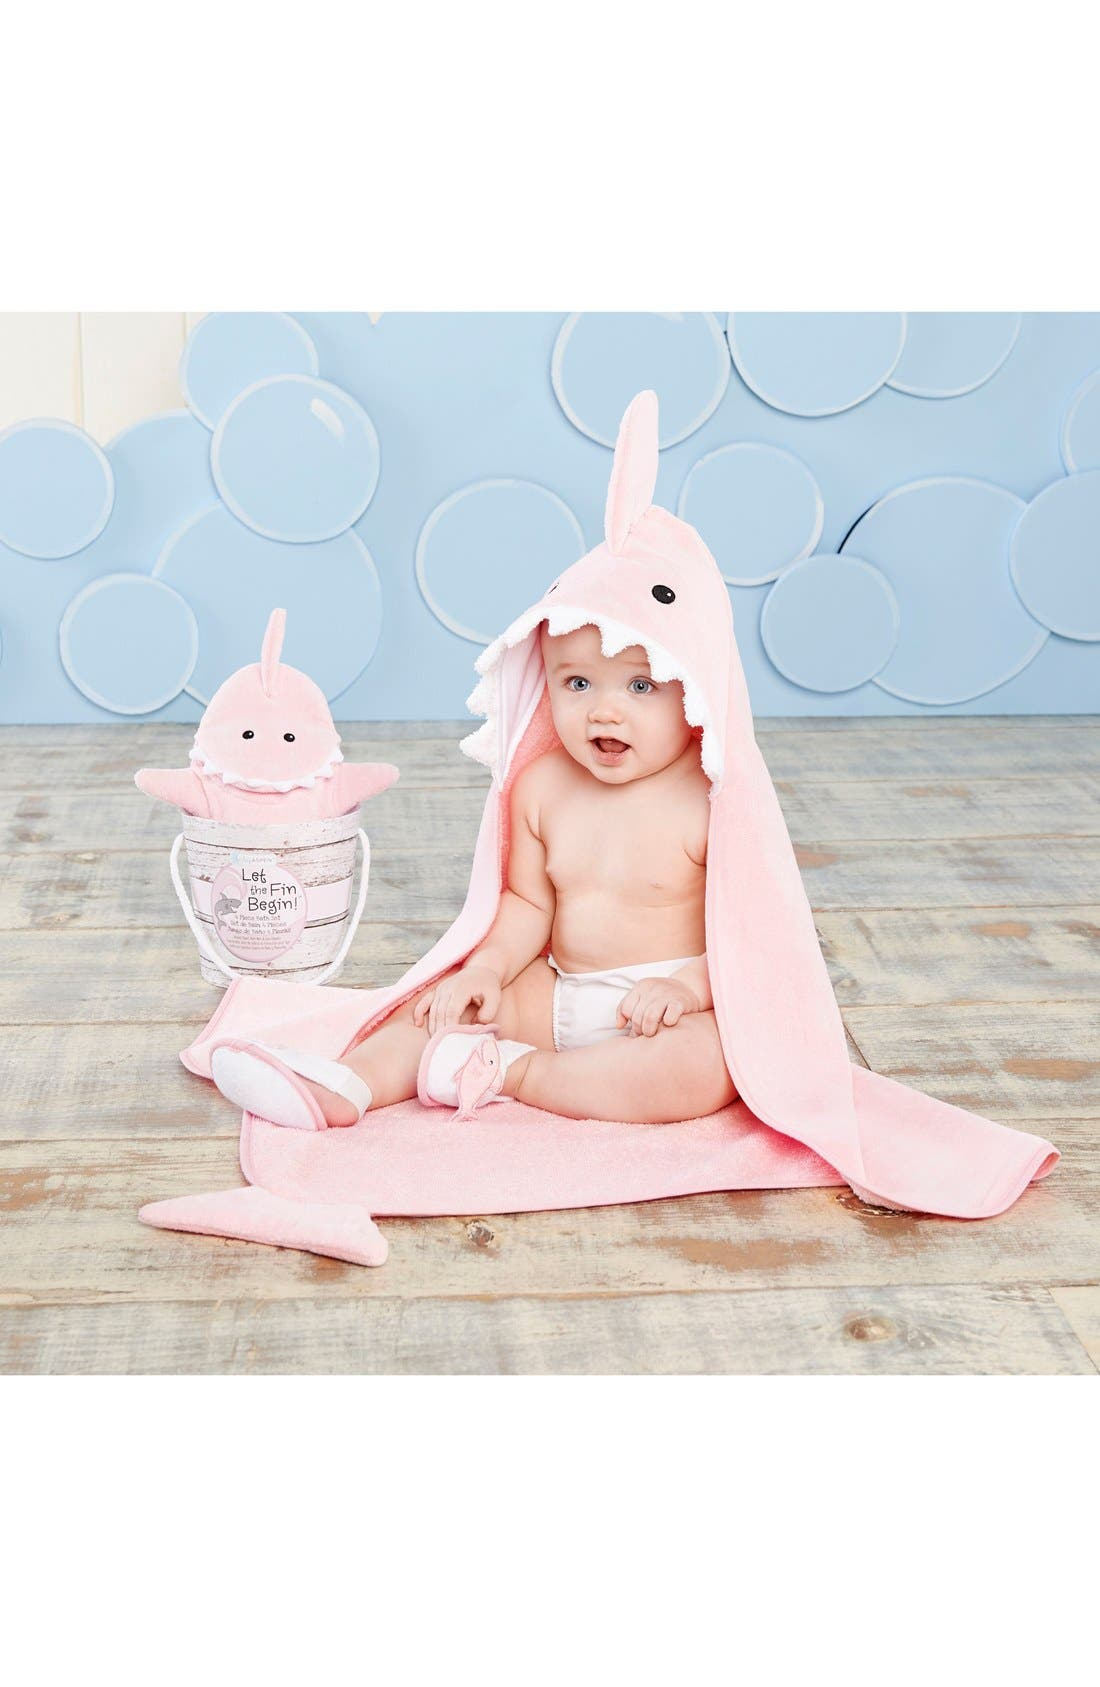 Alternate Image 4  - Baby Aspen 'Let the Fin Begin' Hooded Terry Robe, Bath Mitt & Slippers Set (Baby)